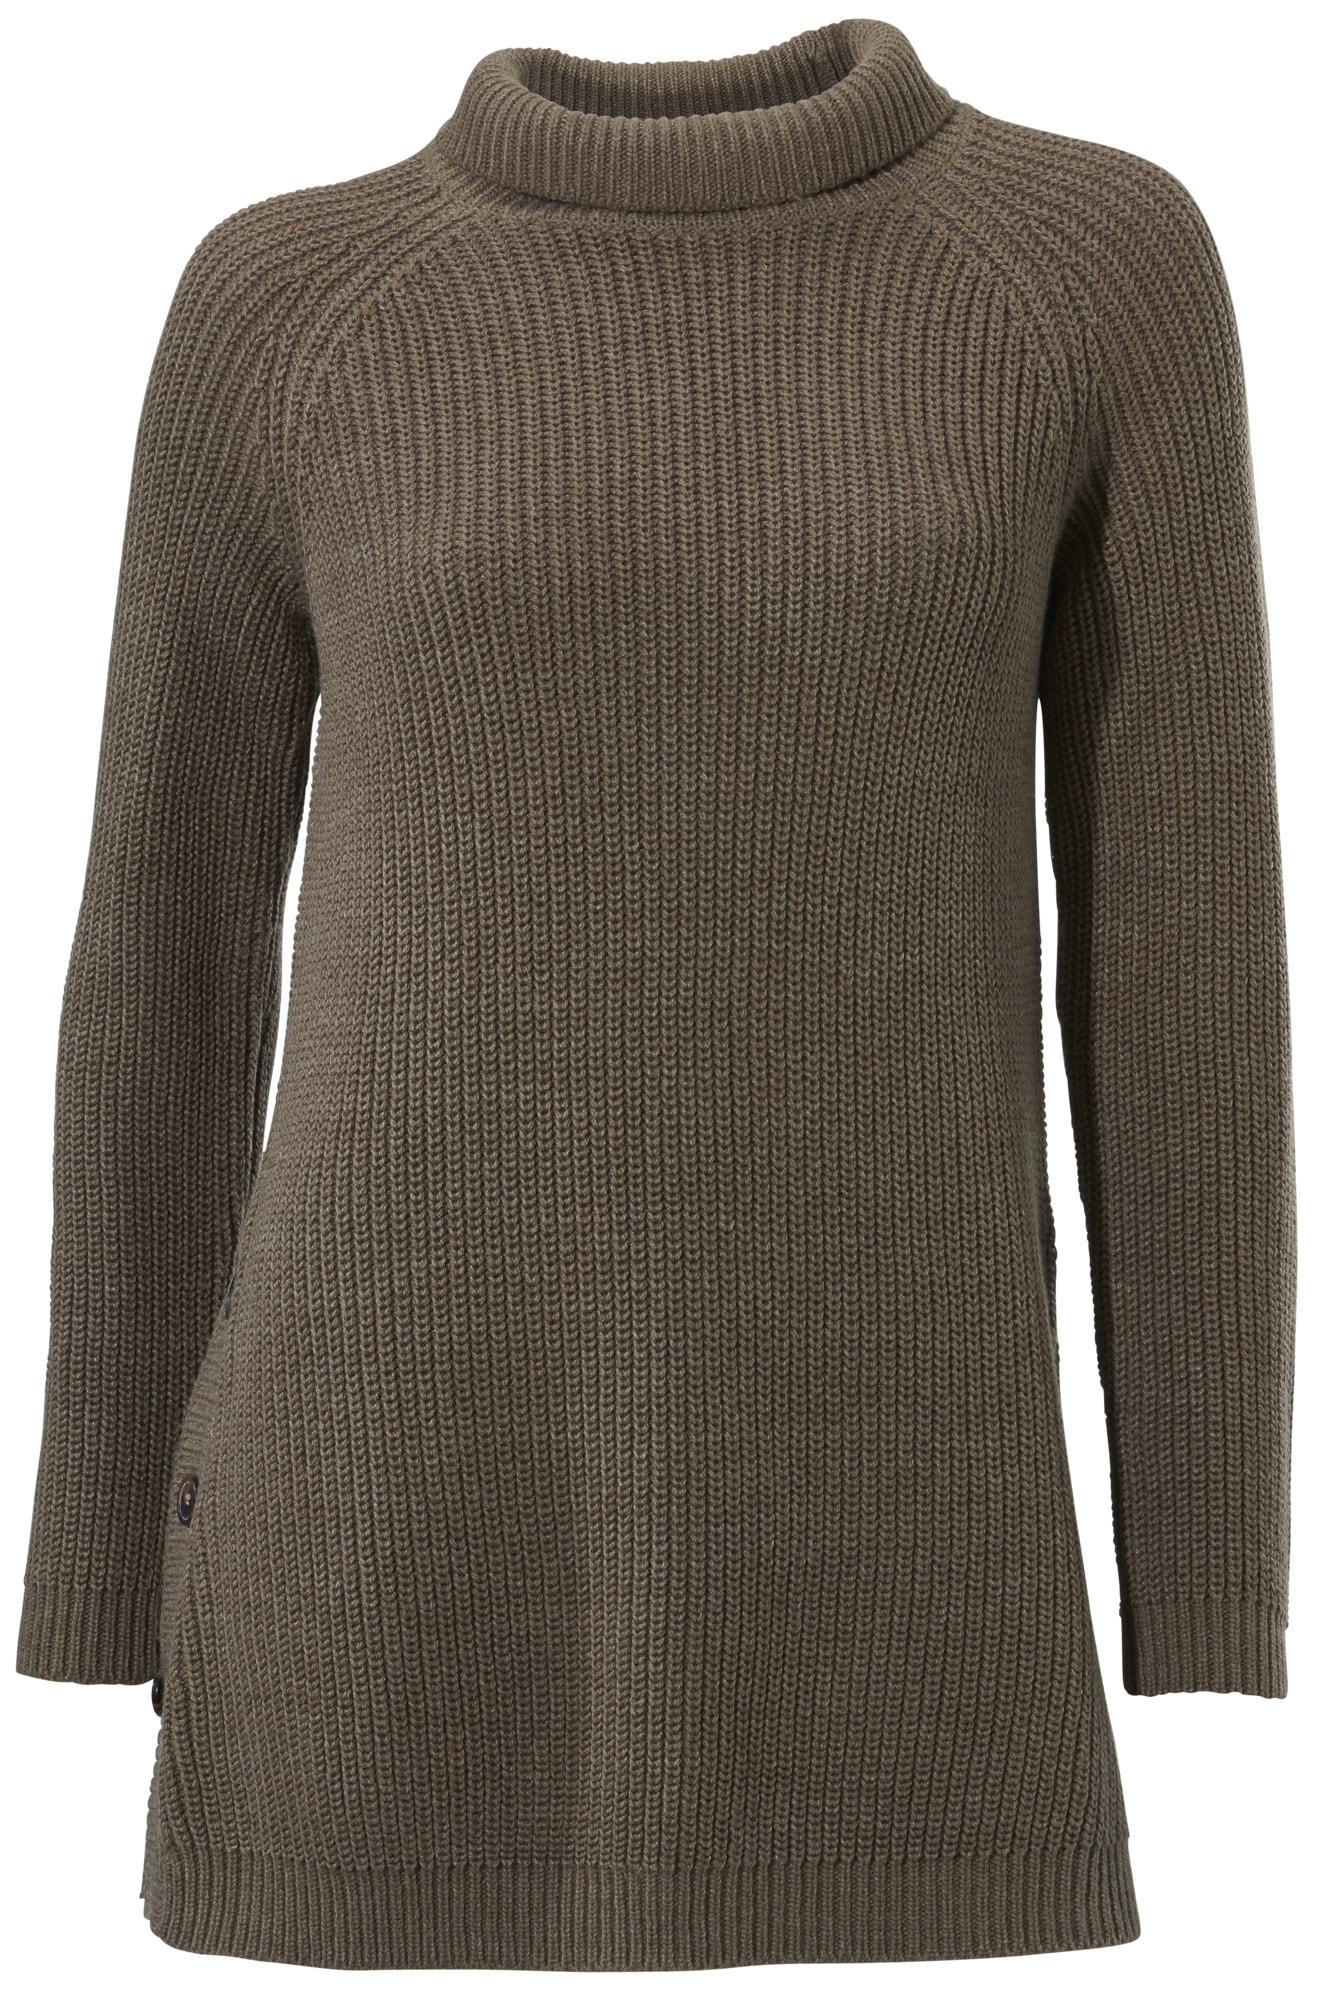 heine CASUAL Stehkragenpullover in Longform | Bekleidung > Pullover > Stehkragenpullover | Ca - Baumwolle | Heine Casual